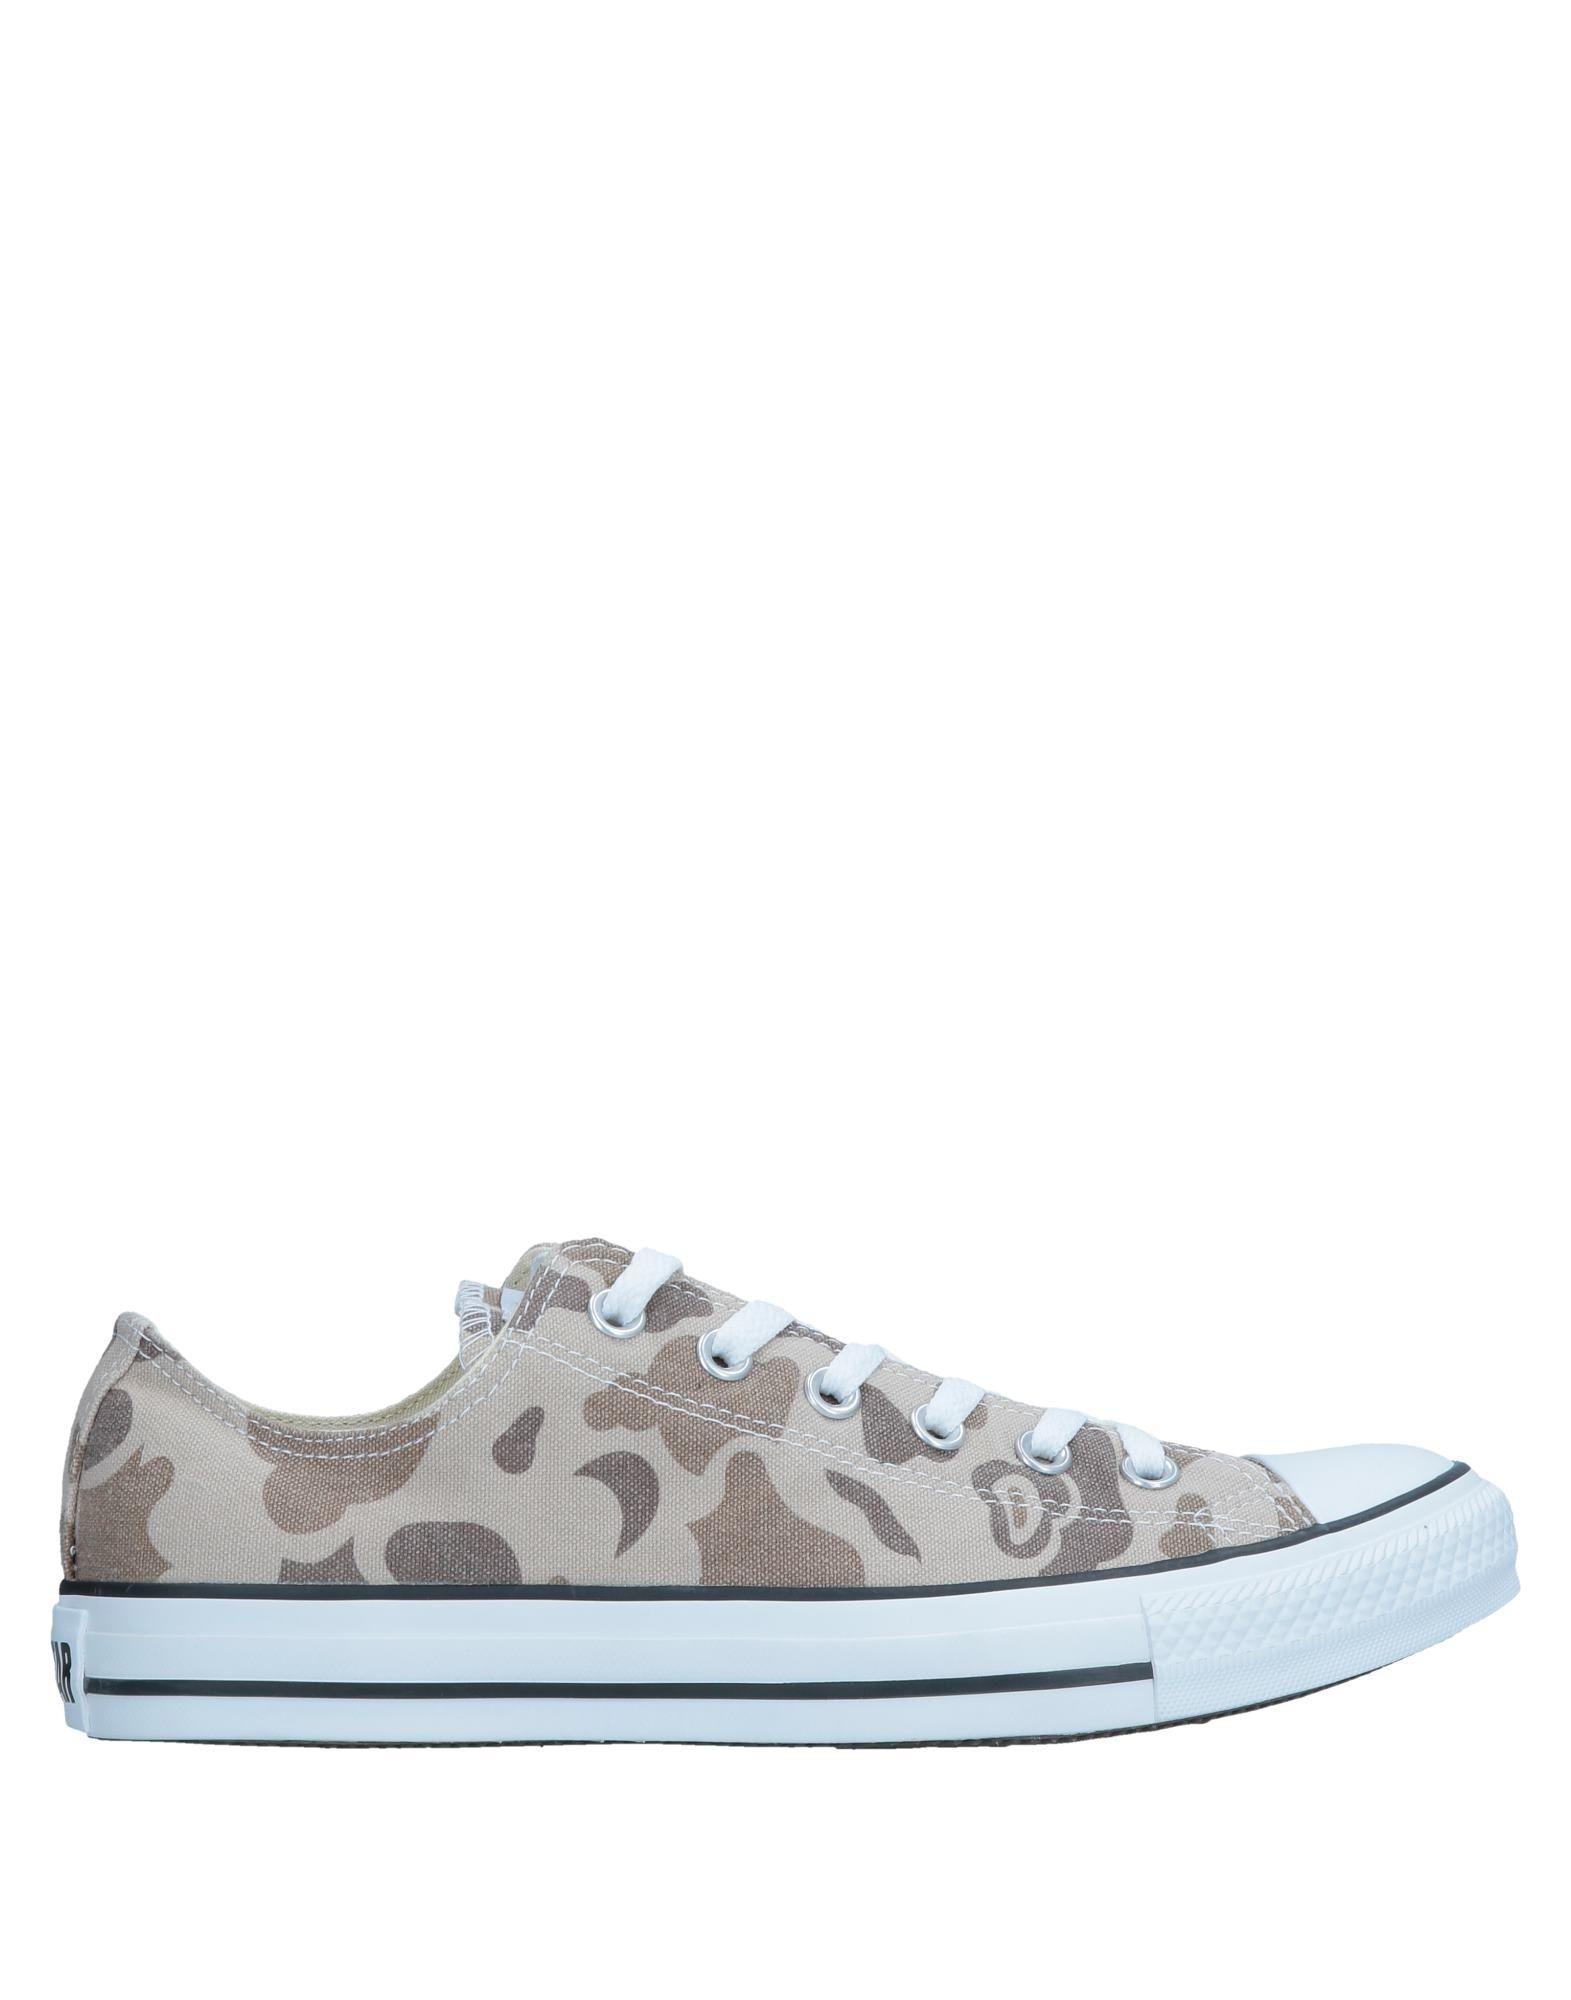 Rabatt echte Schuhe Converse All Star Sneakers Herren  11545715CV